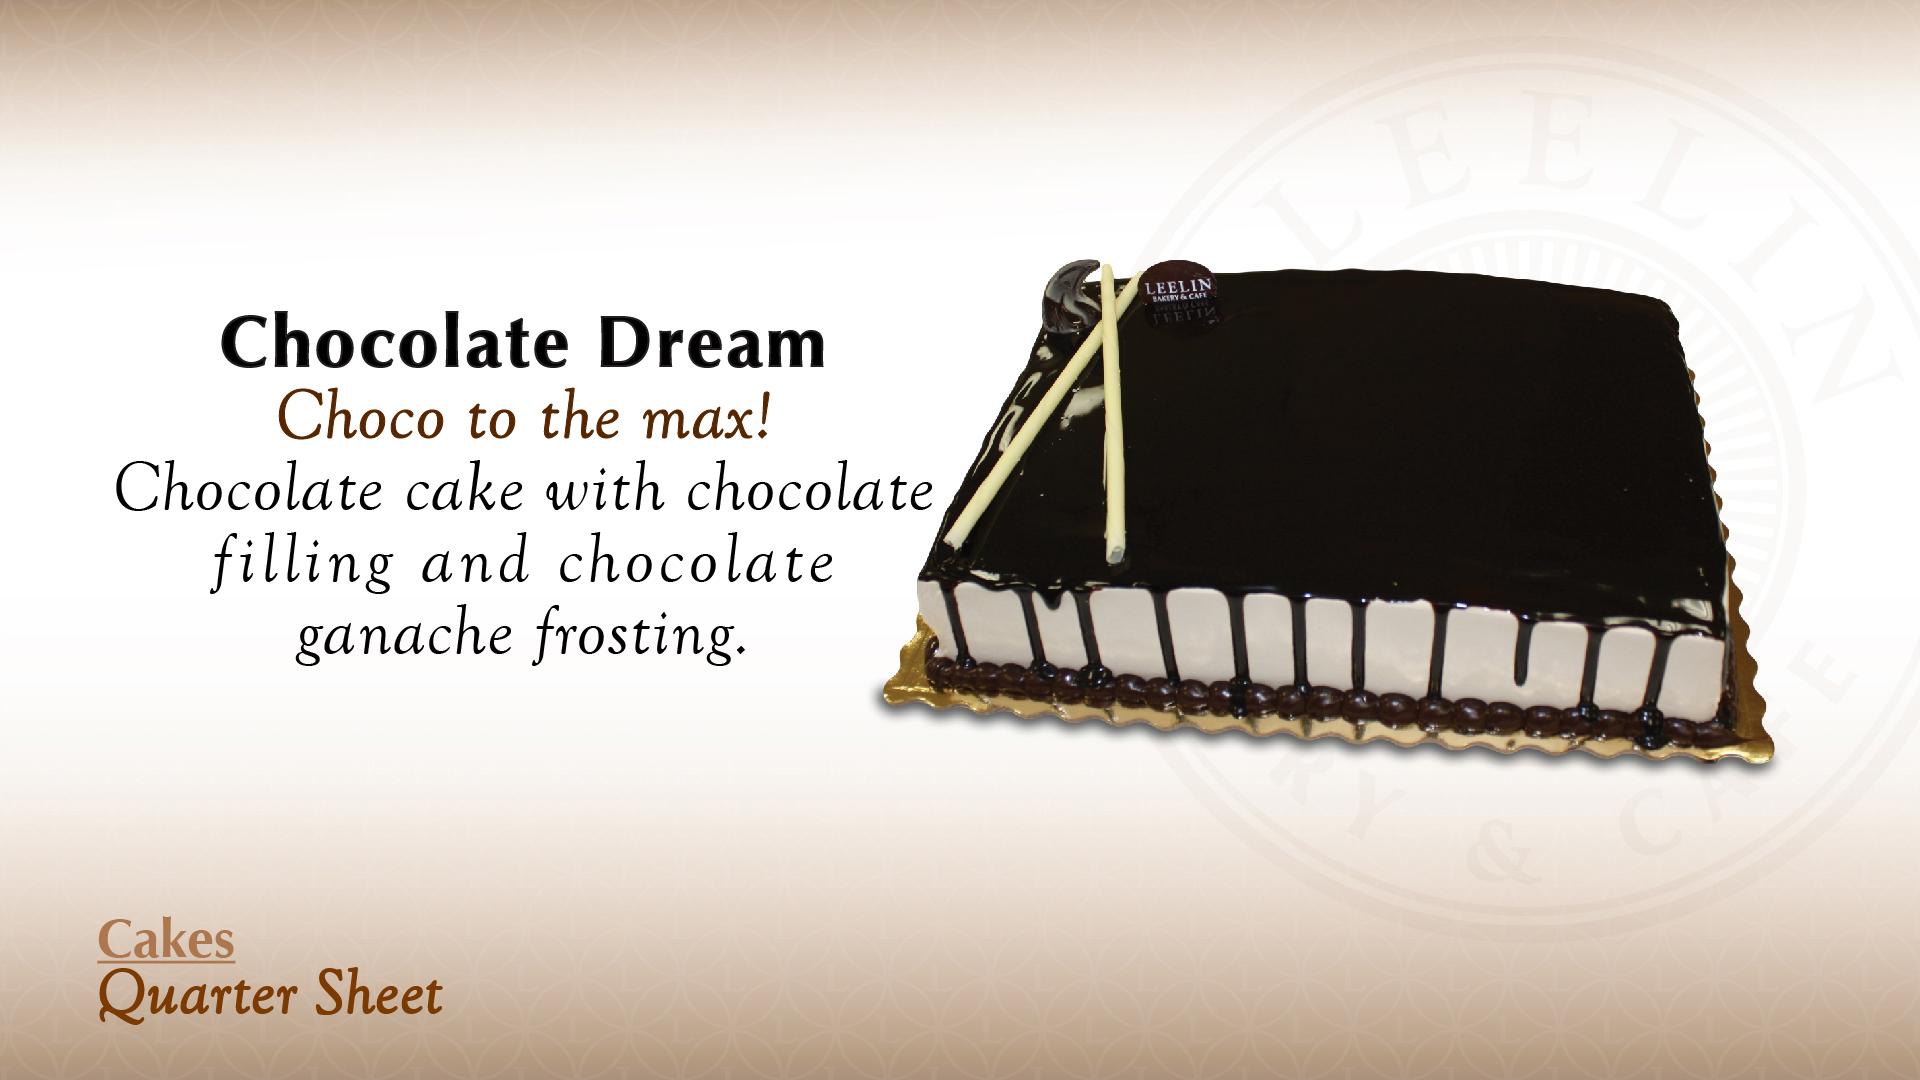 044 Chocolate Dream Quarter Sheet 1920x1080.jpg